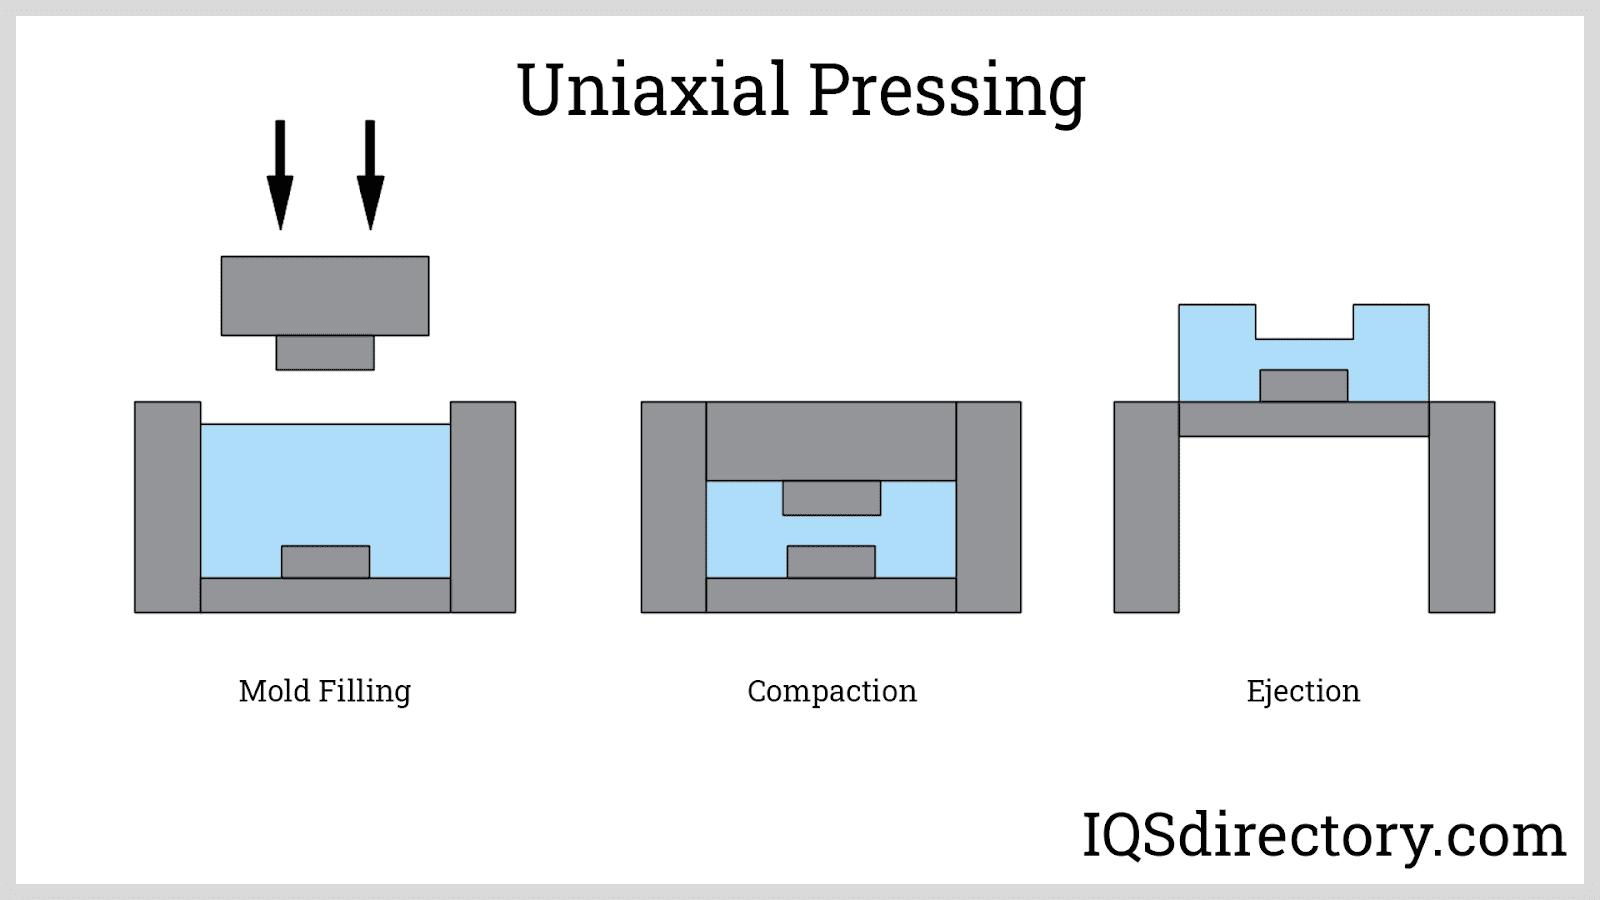 Uniaxial Pressing